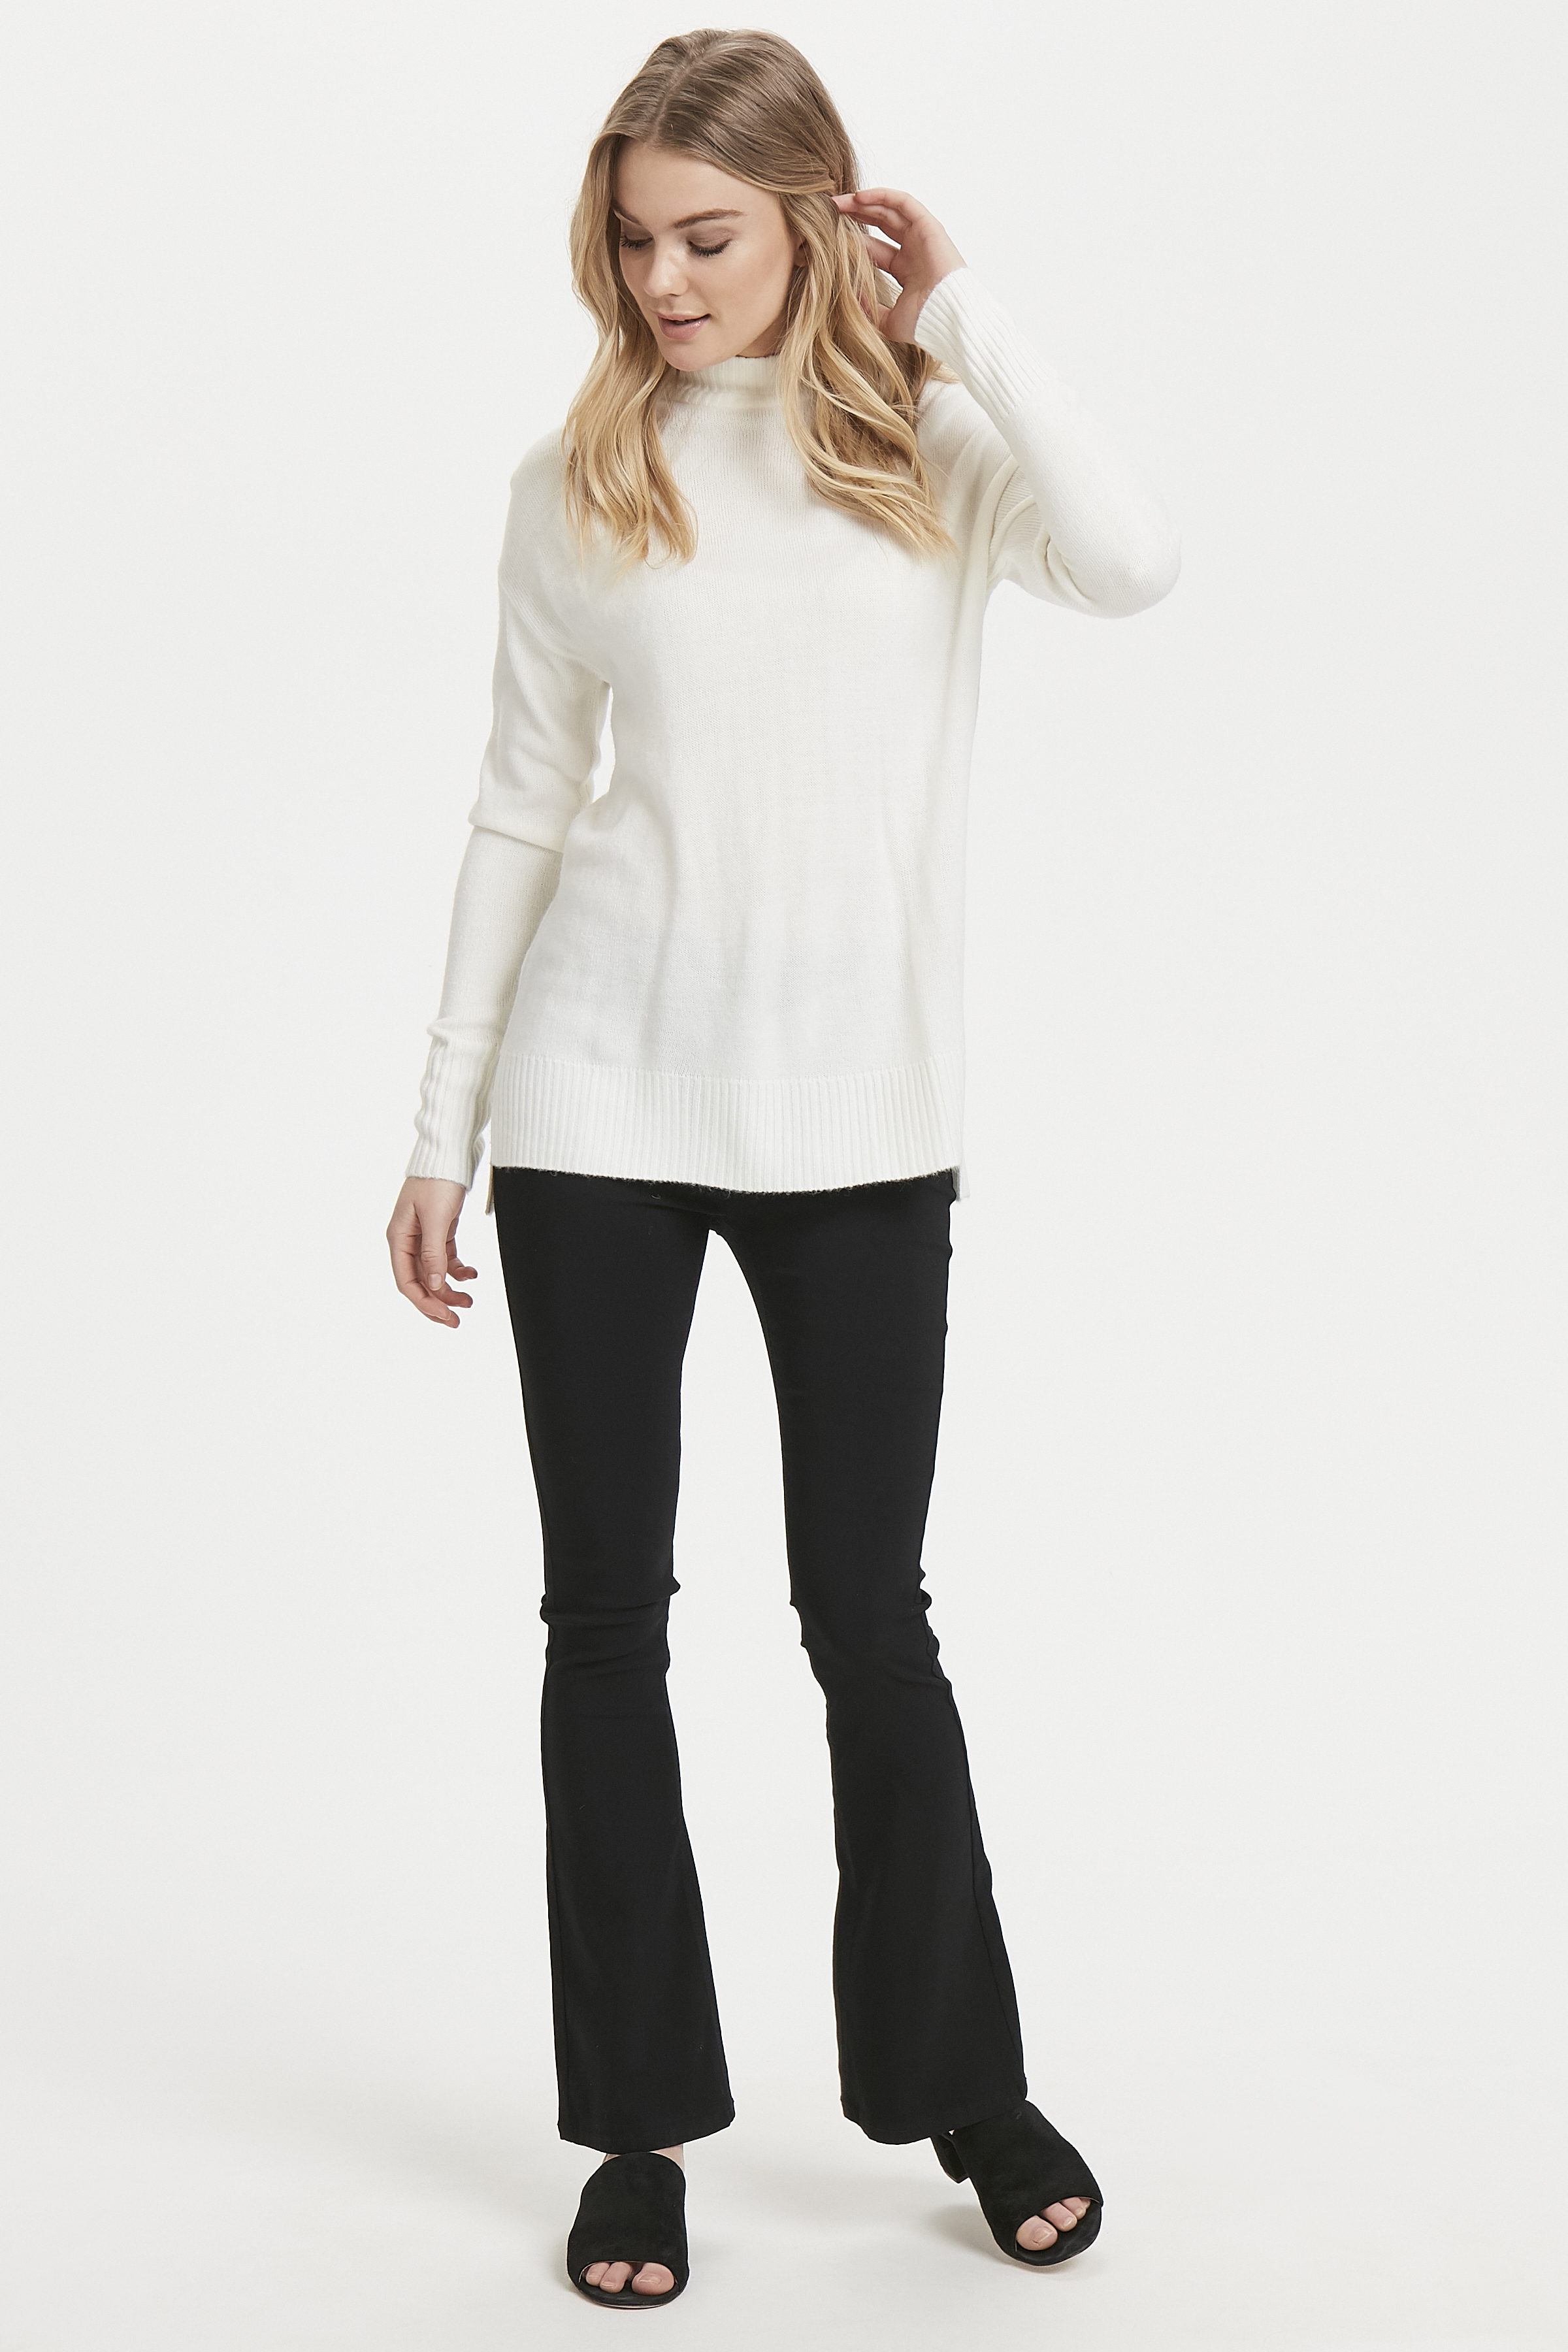 Off White Pullover van b.young – Koop Off White Pullover hier van size XS-XXL